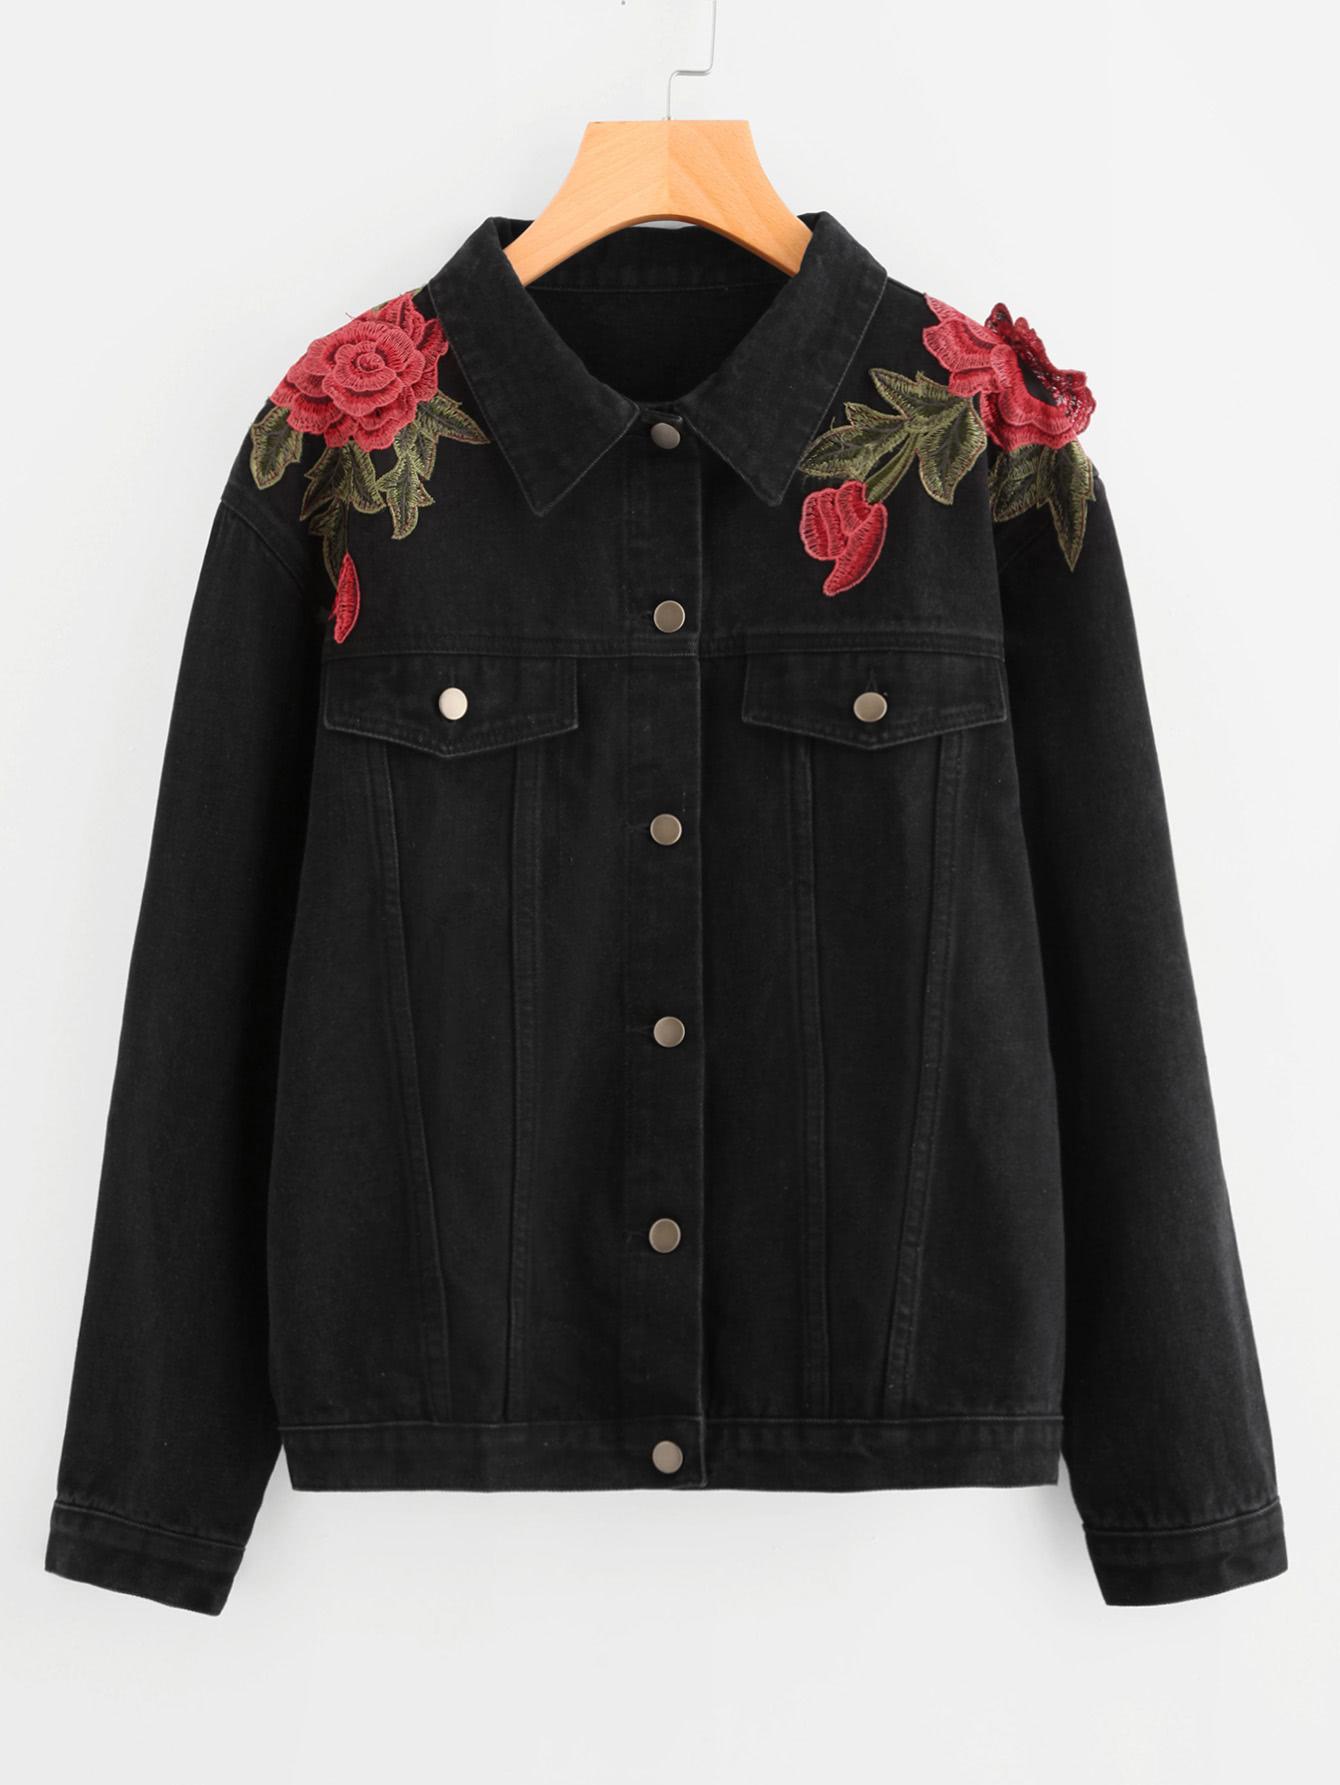 3D Rose Applique Denim Jacket -SheIn(Sheinside)